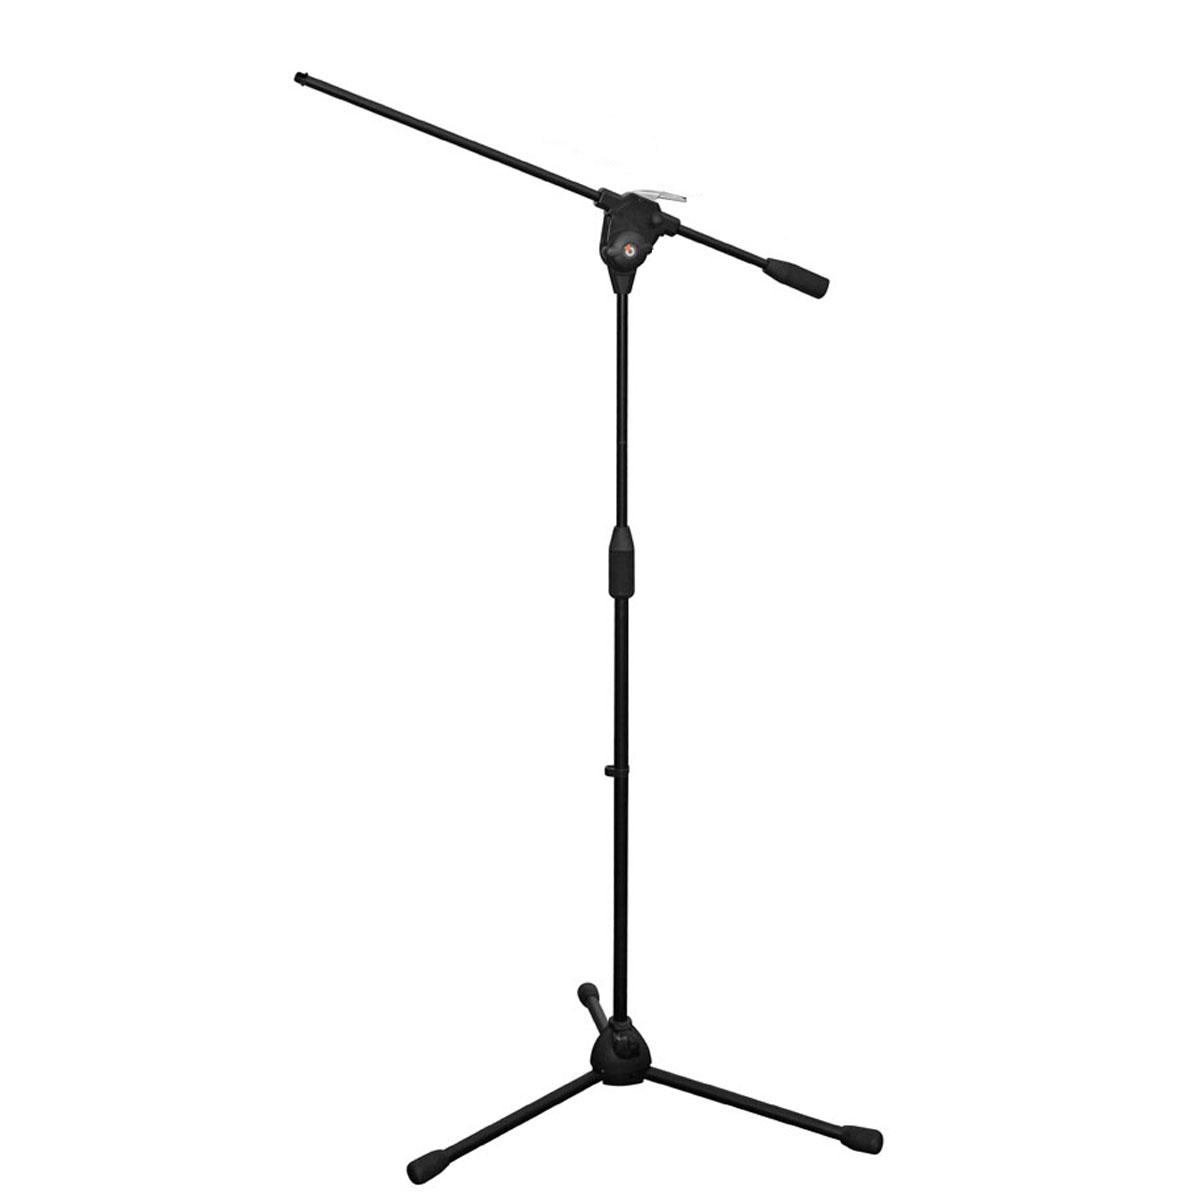 BESPECO ベスペコ / MSF01C Microphone boom Stand マイクスタンド【お取り寄せ商品】